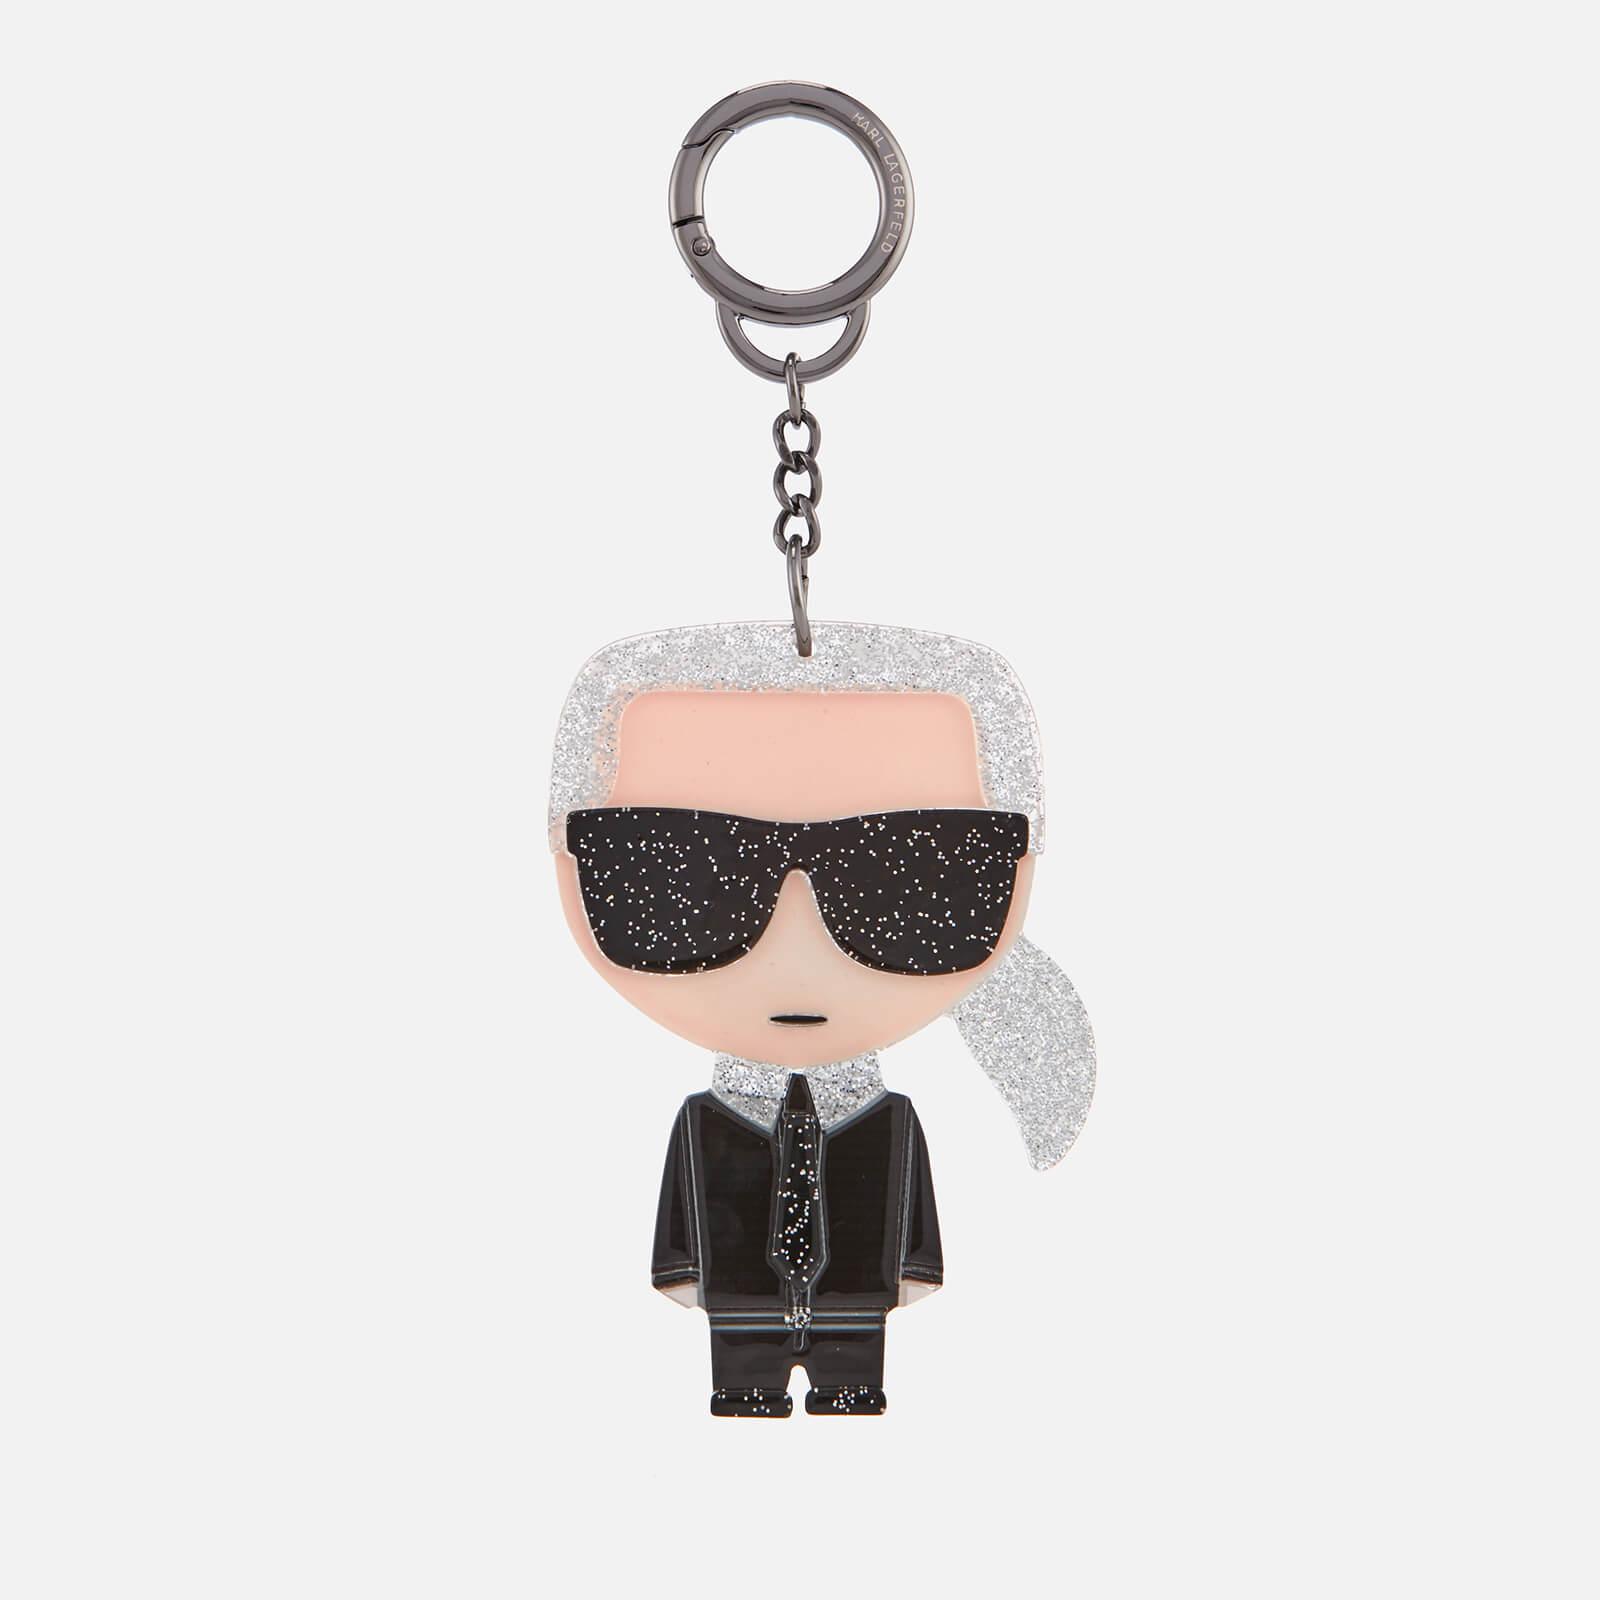 fd901c4d76a6 Karl Lagerfeld Women s K Ikonik Karl Plexi Keychain - Clear - Free UK  Delivery over £50